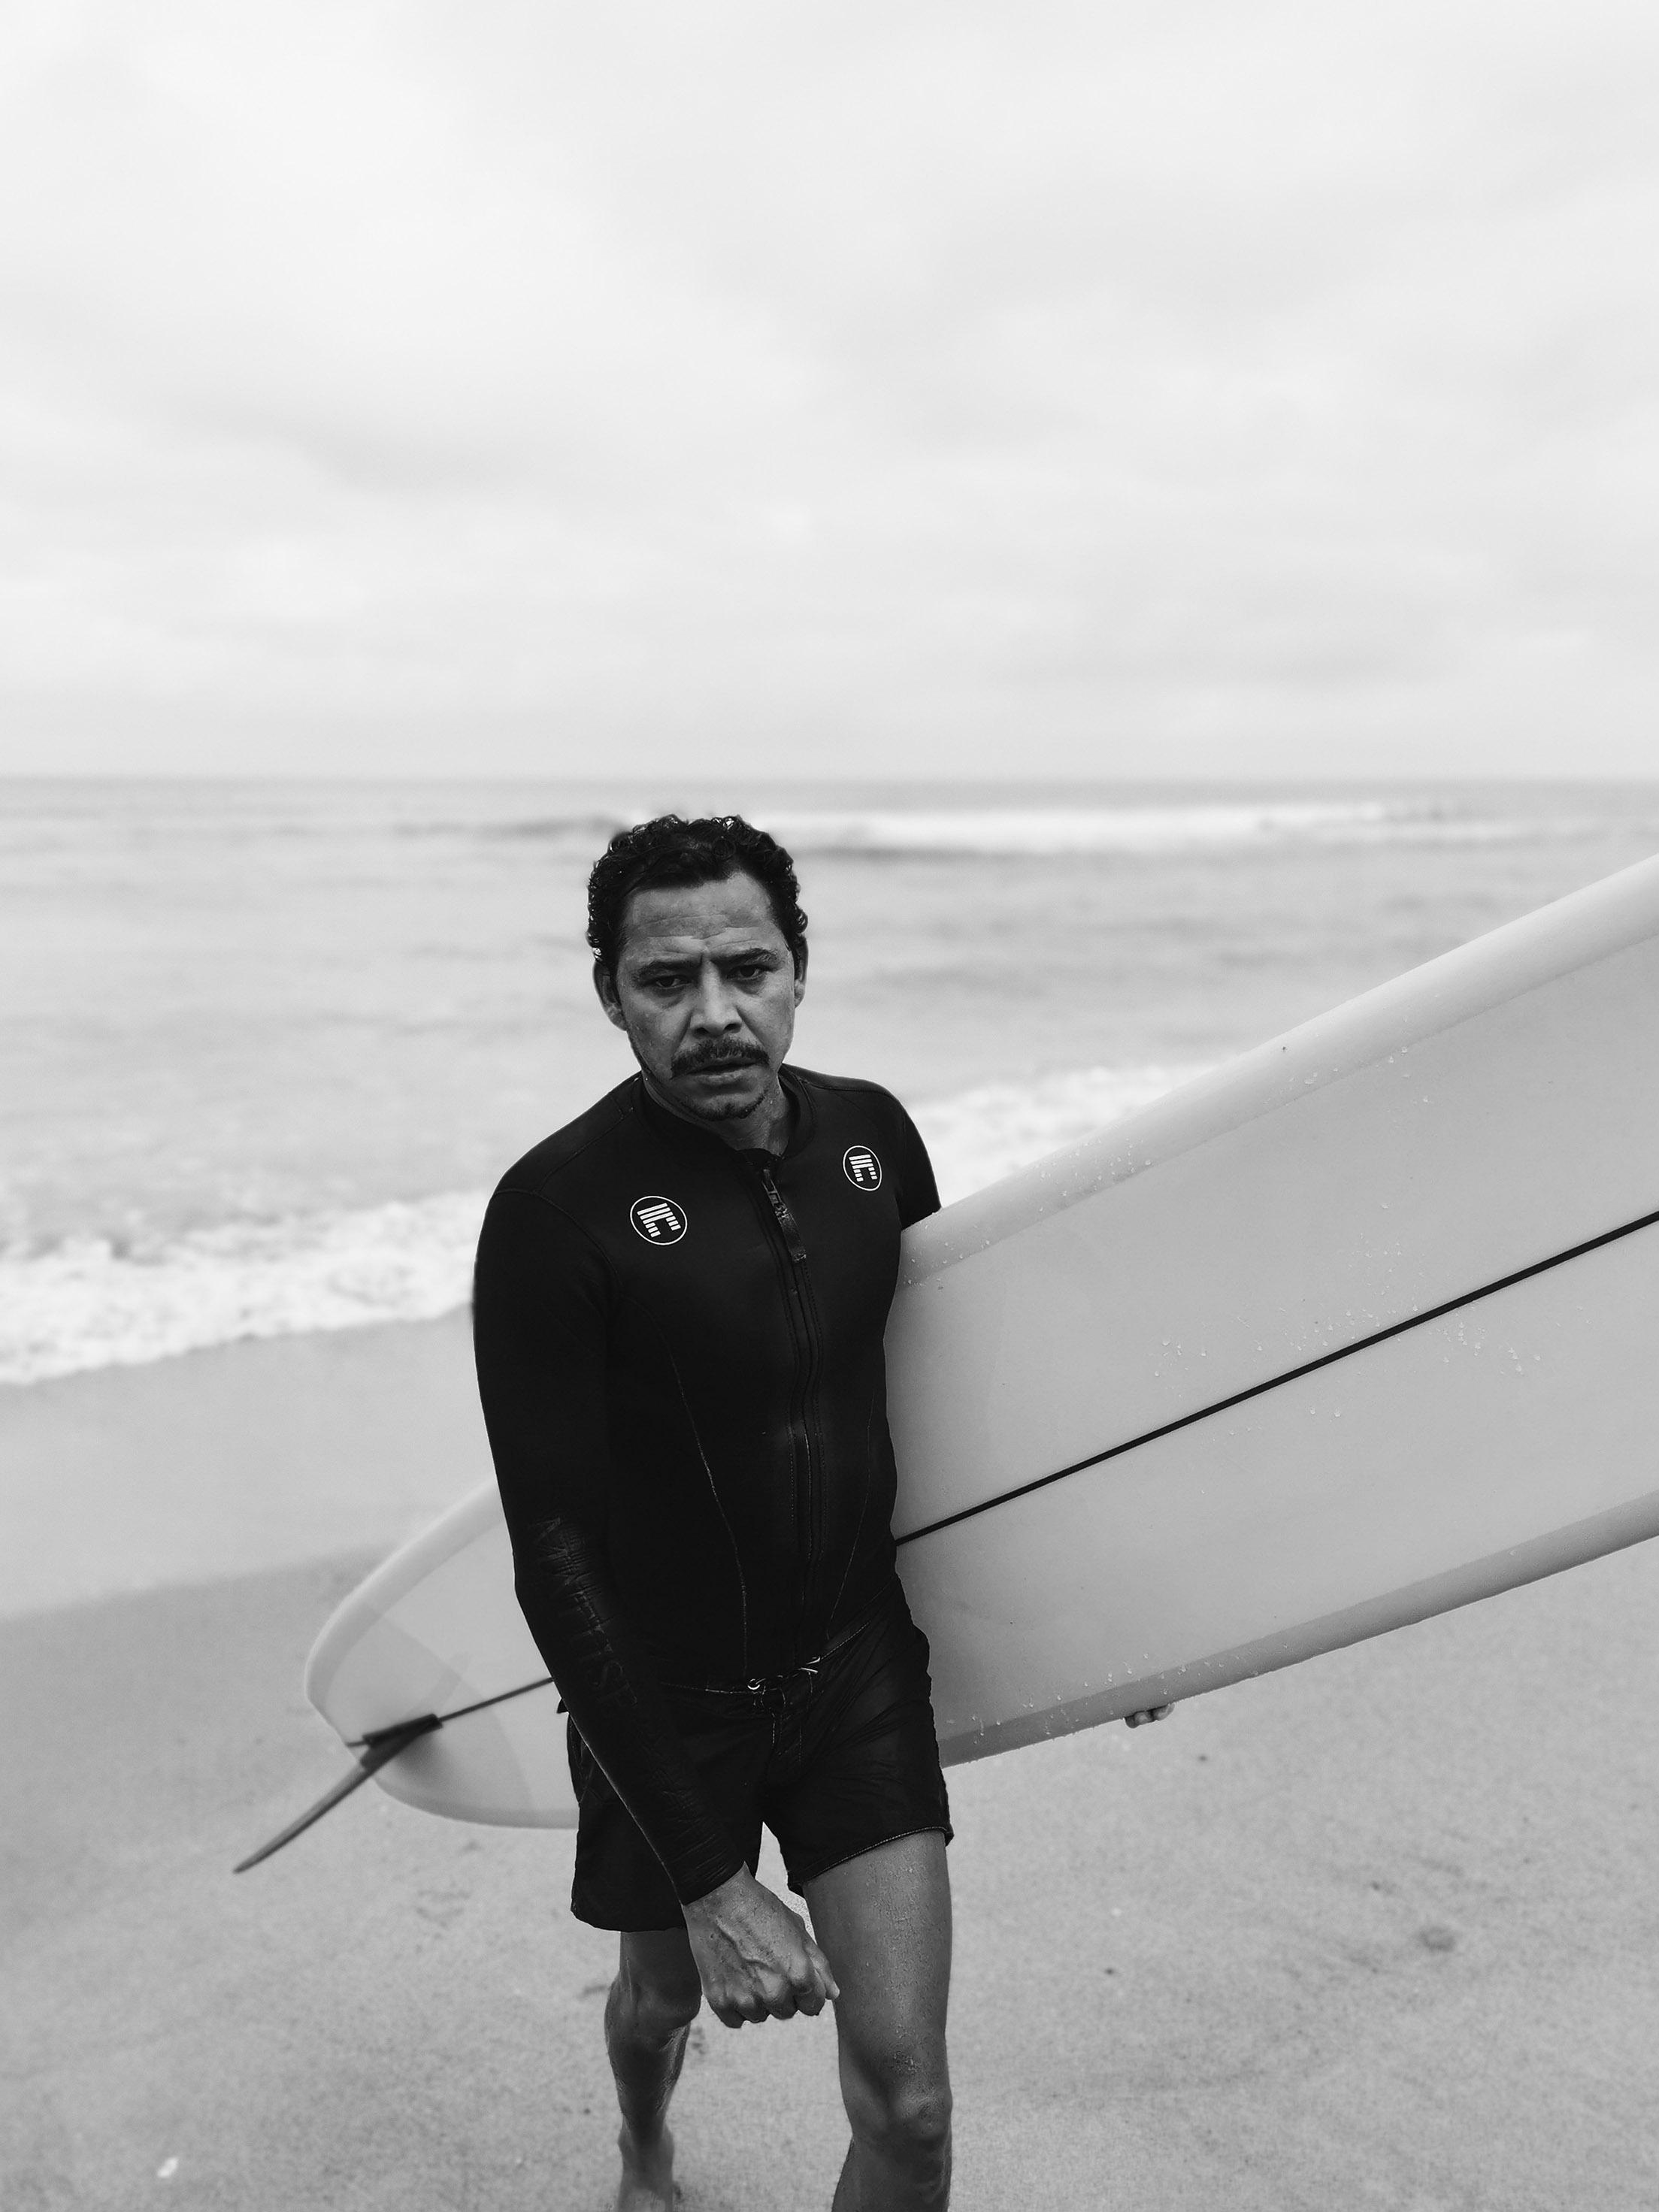 Huawei-Sayulita-Diego-Cadena-Kalle-Carranza-Isael-Preciado-Surf-Mexico-Heiko-Bothe-23.jpg